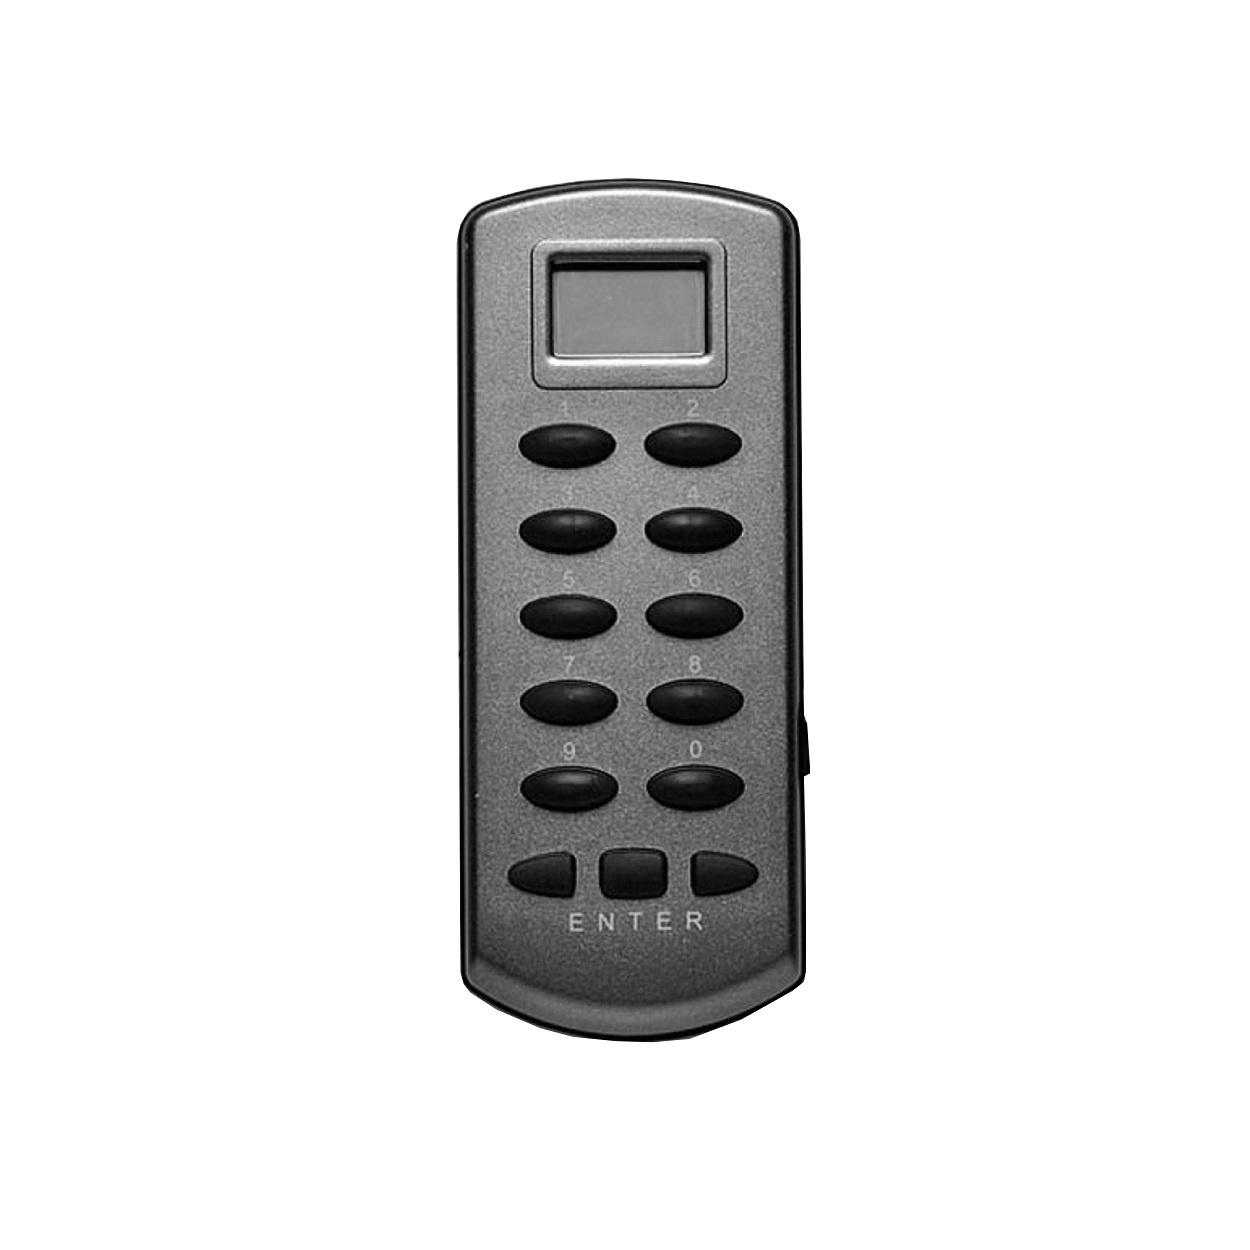 Marantec Digital 317 multi-bit 868 MHz - 999 kanaals handzender